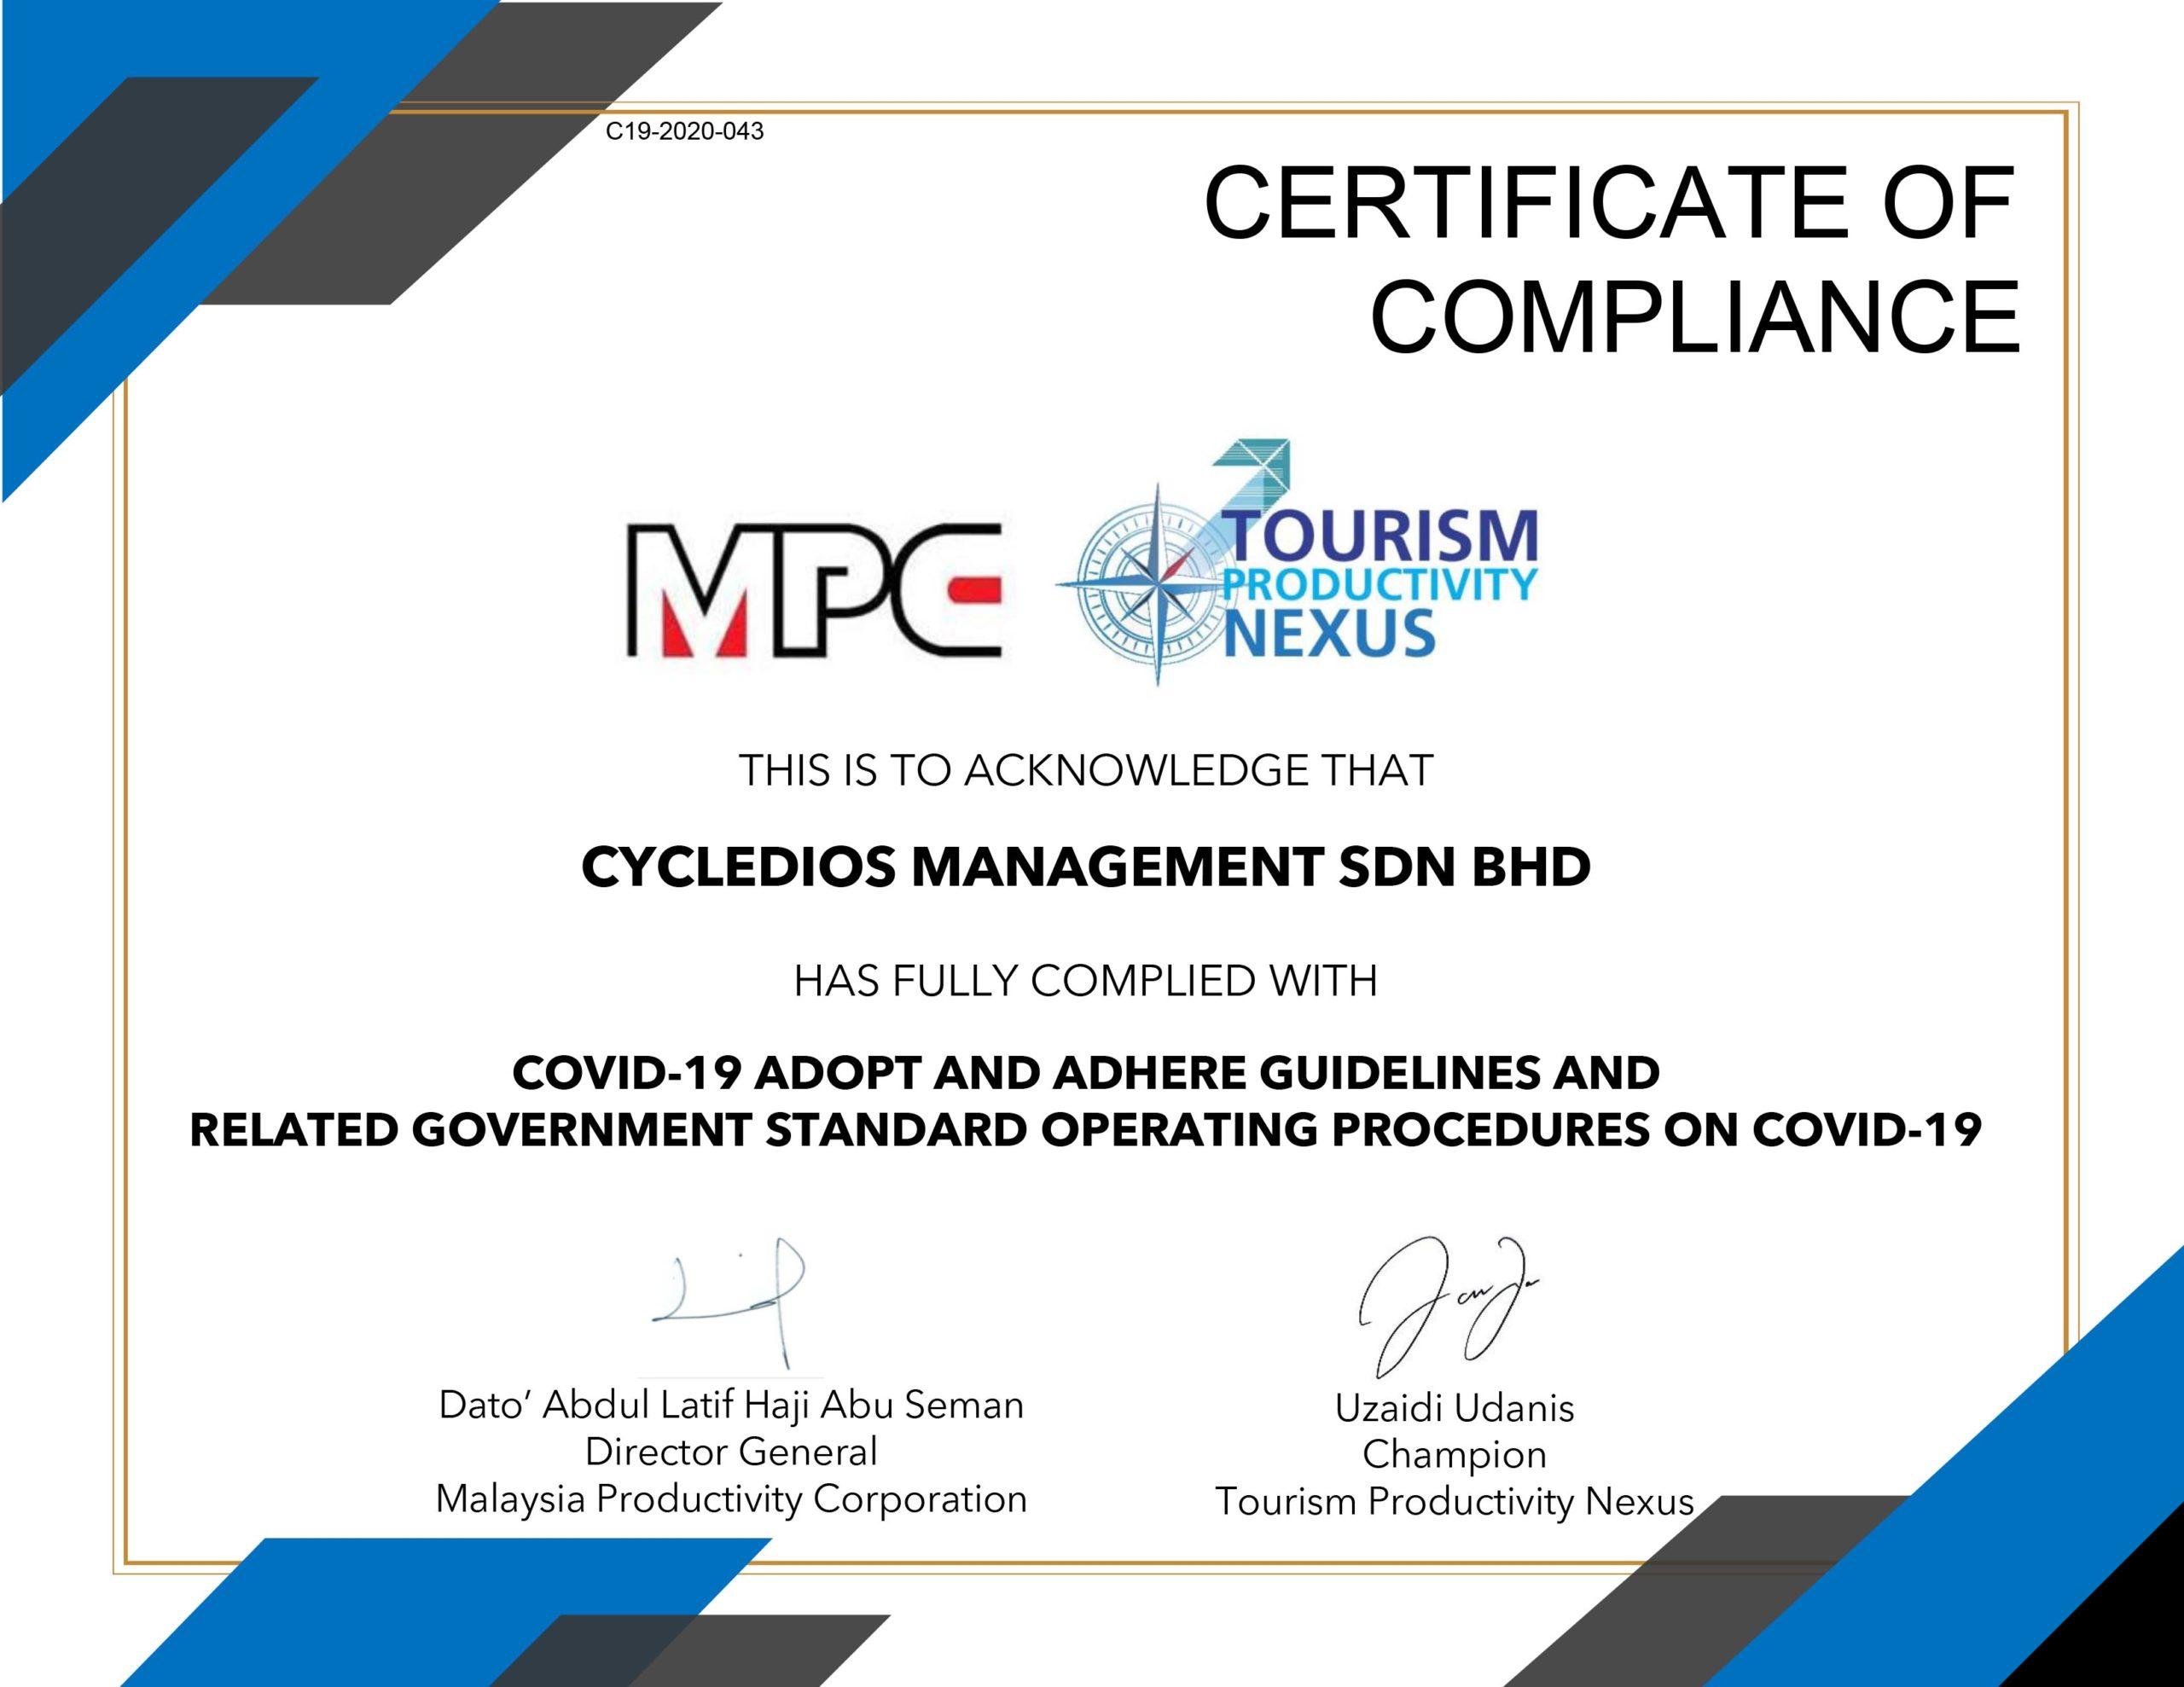 Cert - 043 CYCLEDIOS MANAGEMENT SDN BHD CERTIFICATE GPPAC19